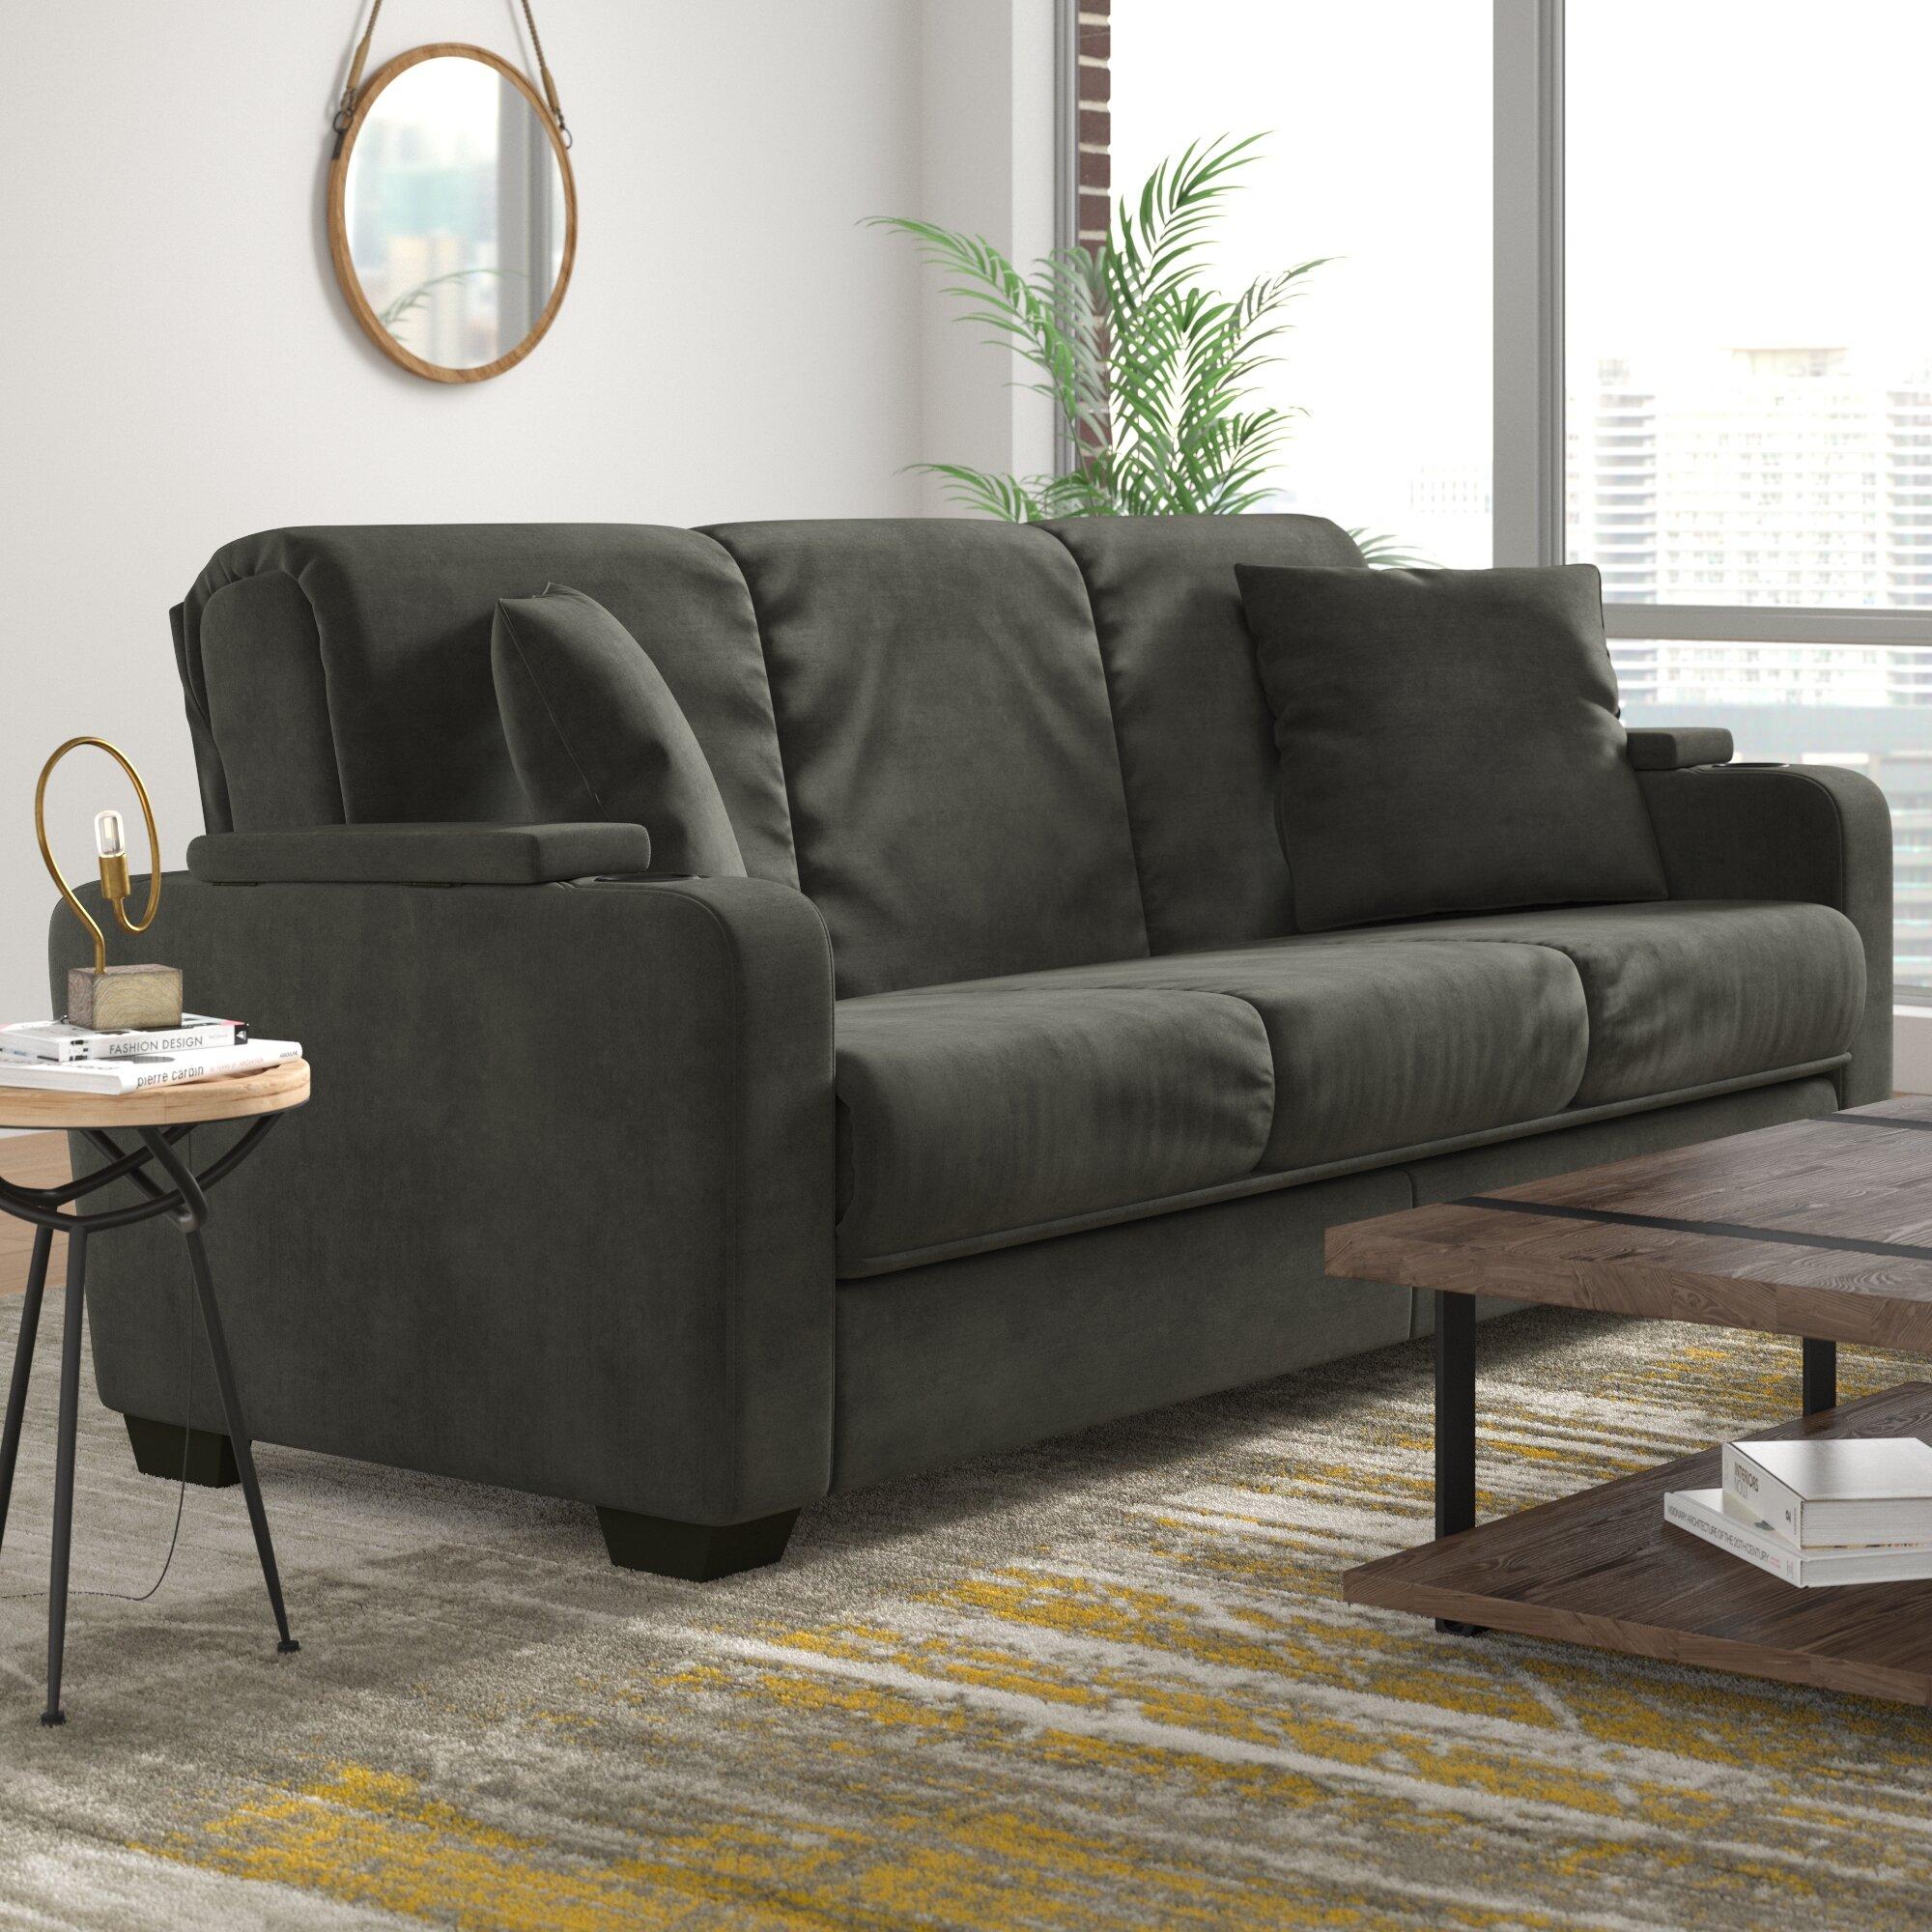 Awe Inspiring Ciera Convertible Sleeper Sofa Inzonedesignstudio Interior Chair Design Inzonedesignstudiocom